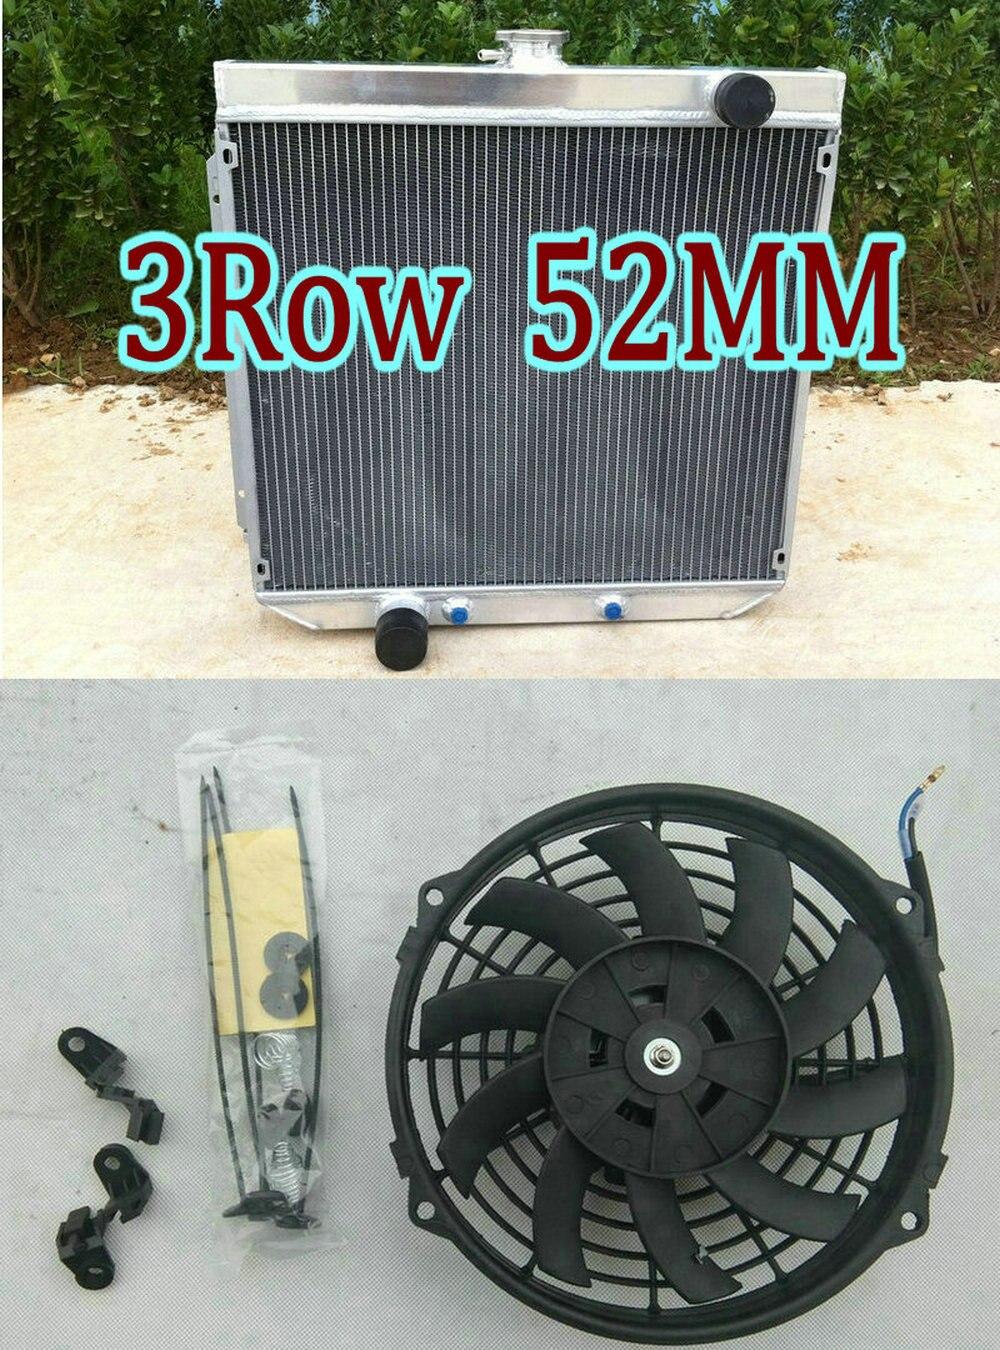 Fairlane// Falcon// Ranchero V8 3 Row Radiator+Shroud Fan fit 67-70 Ford Mustang